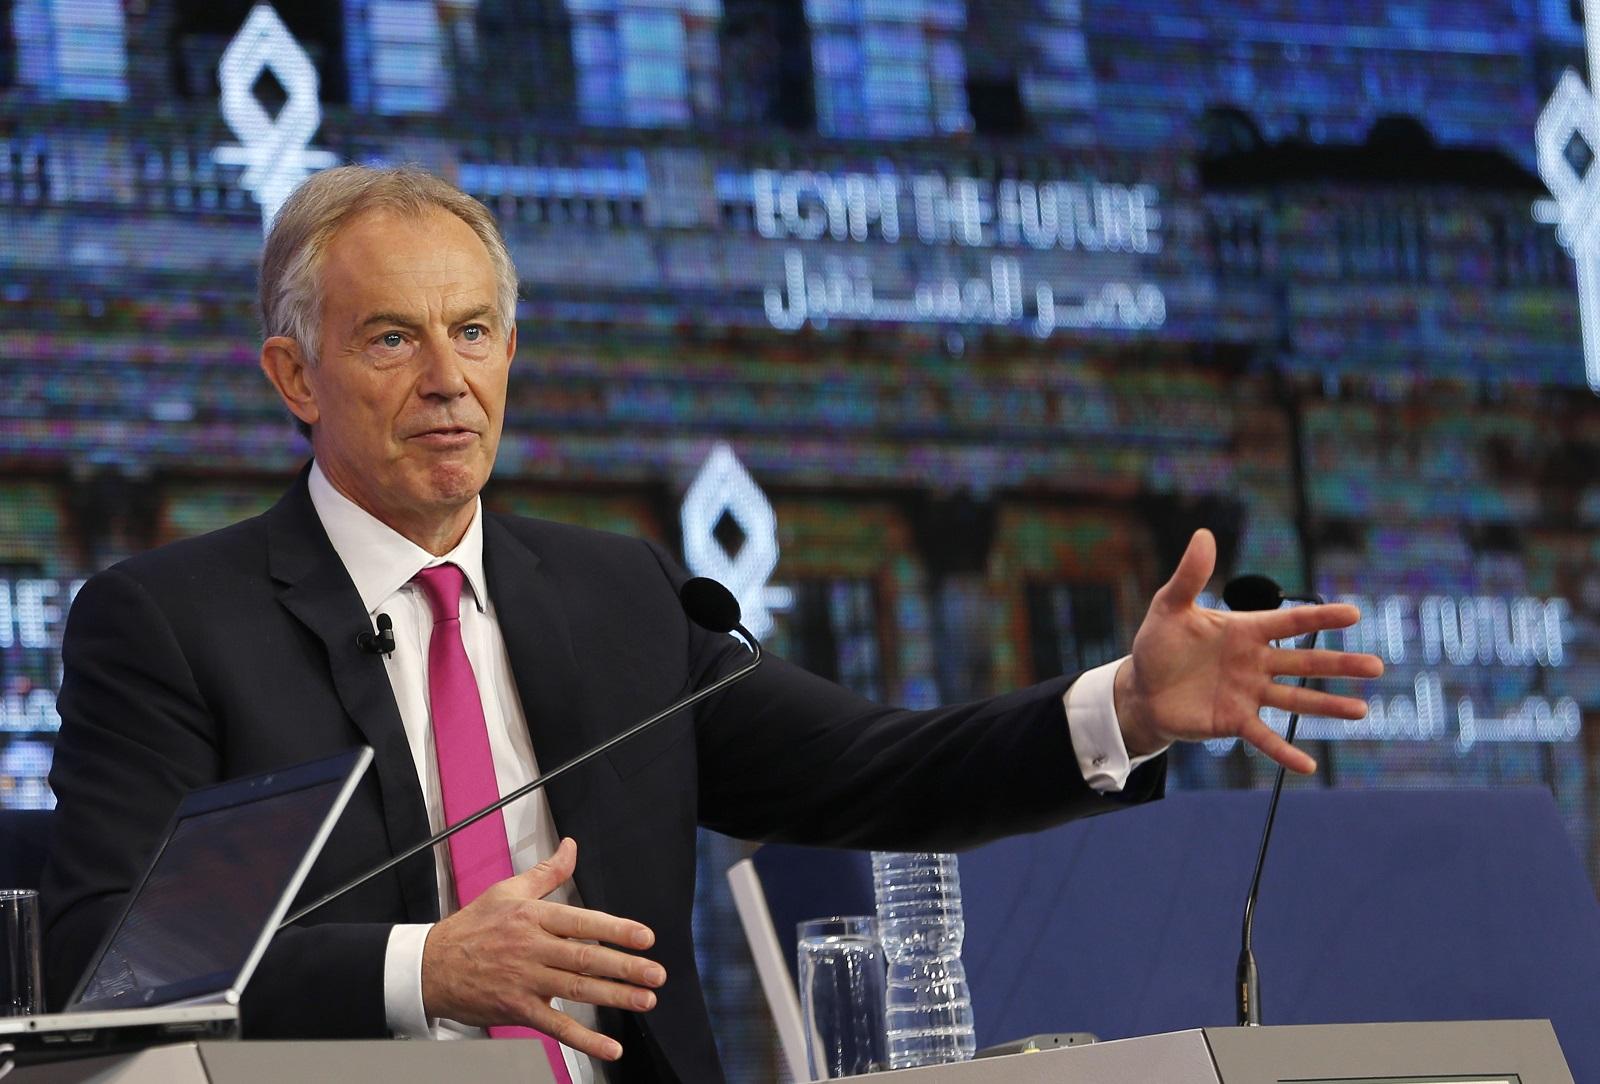 Tony Blair to head anti-Semitism body